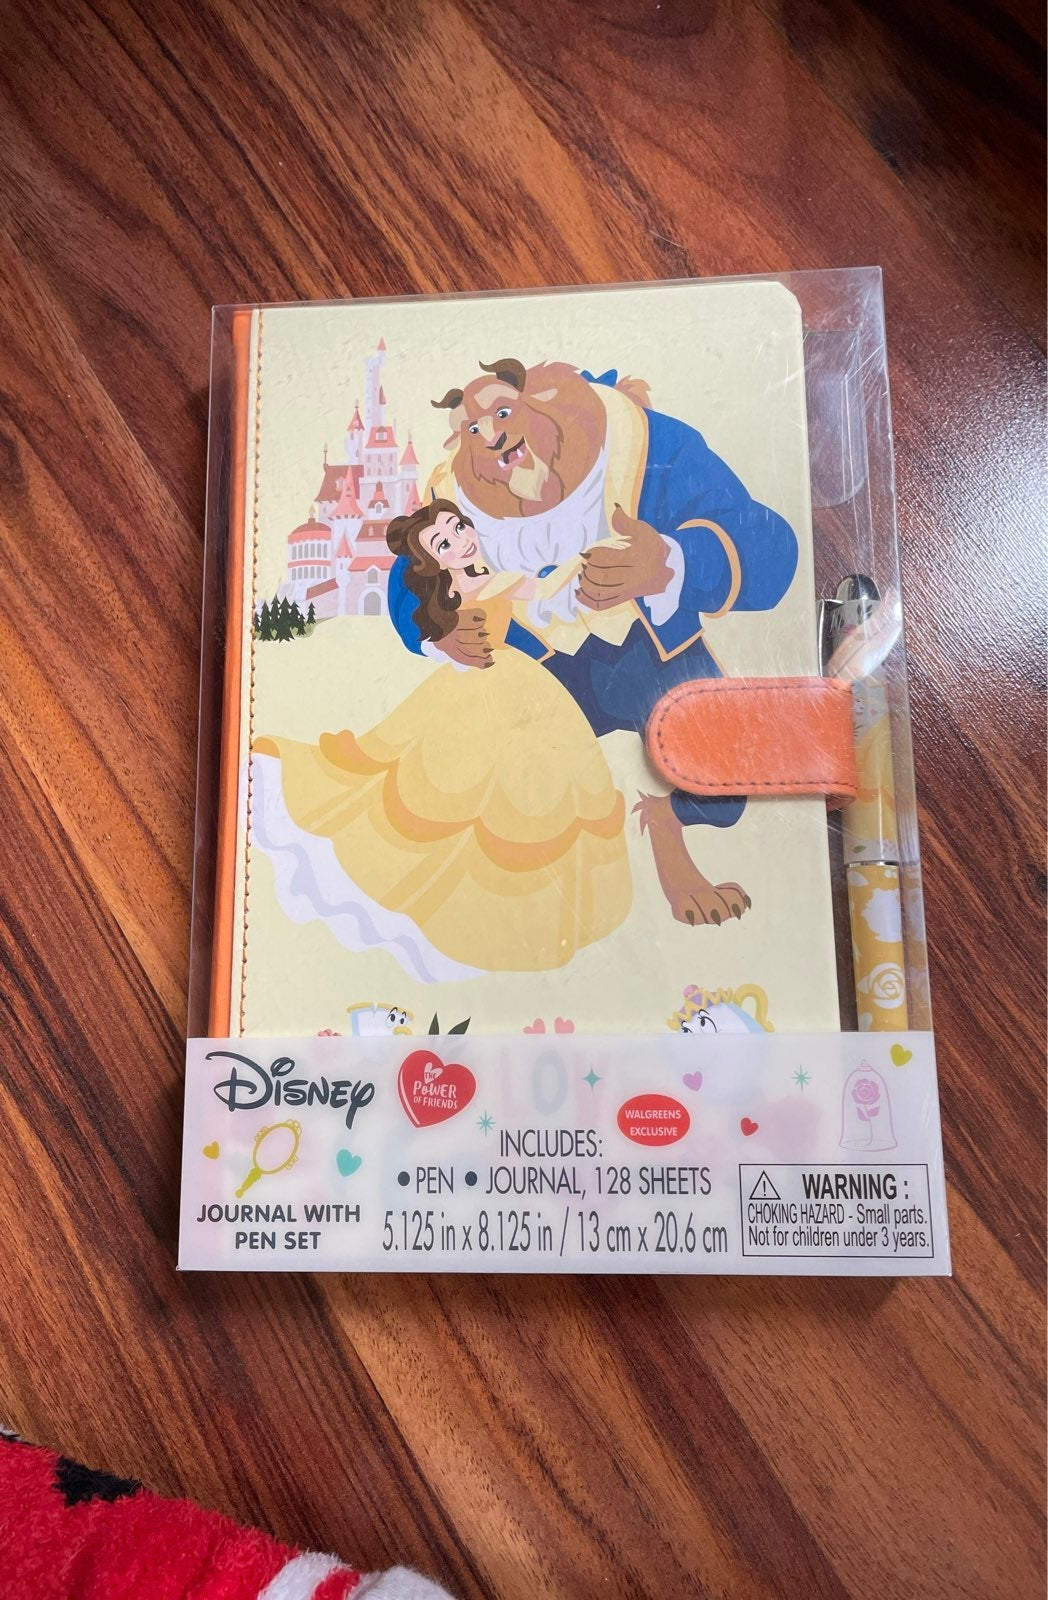 Disney Belle Hardback Journal with Pen